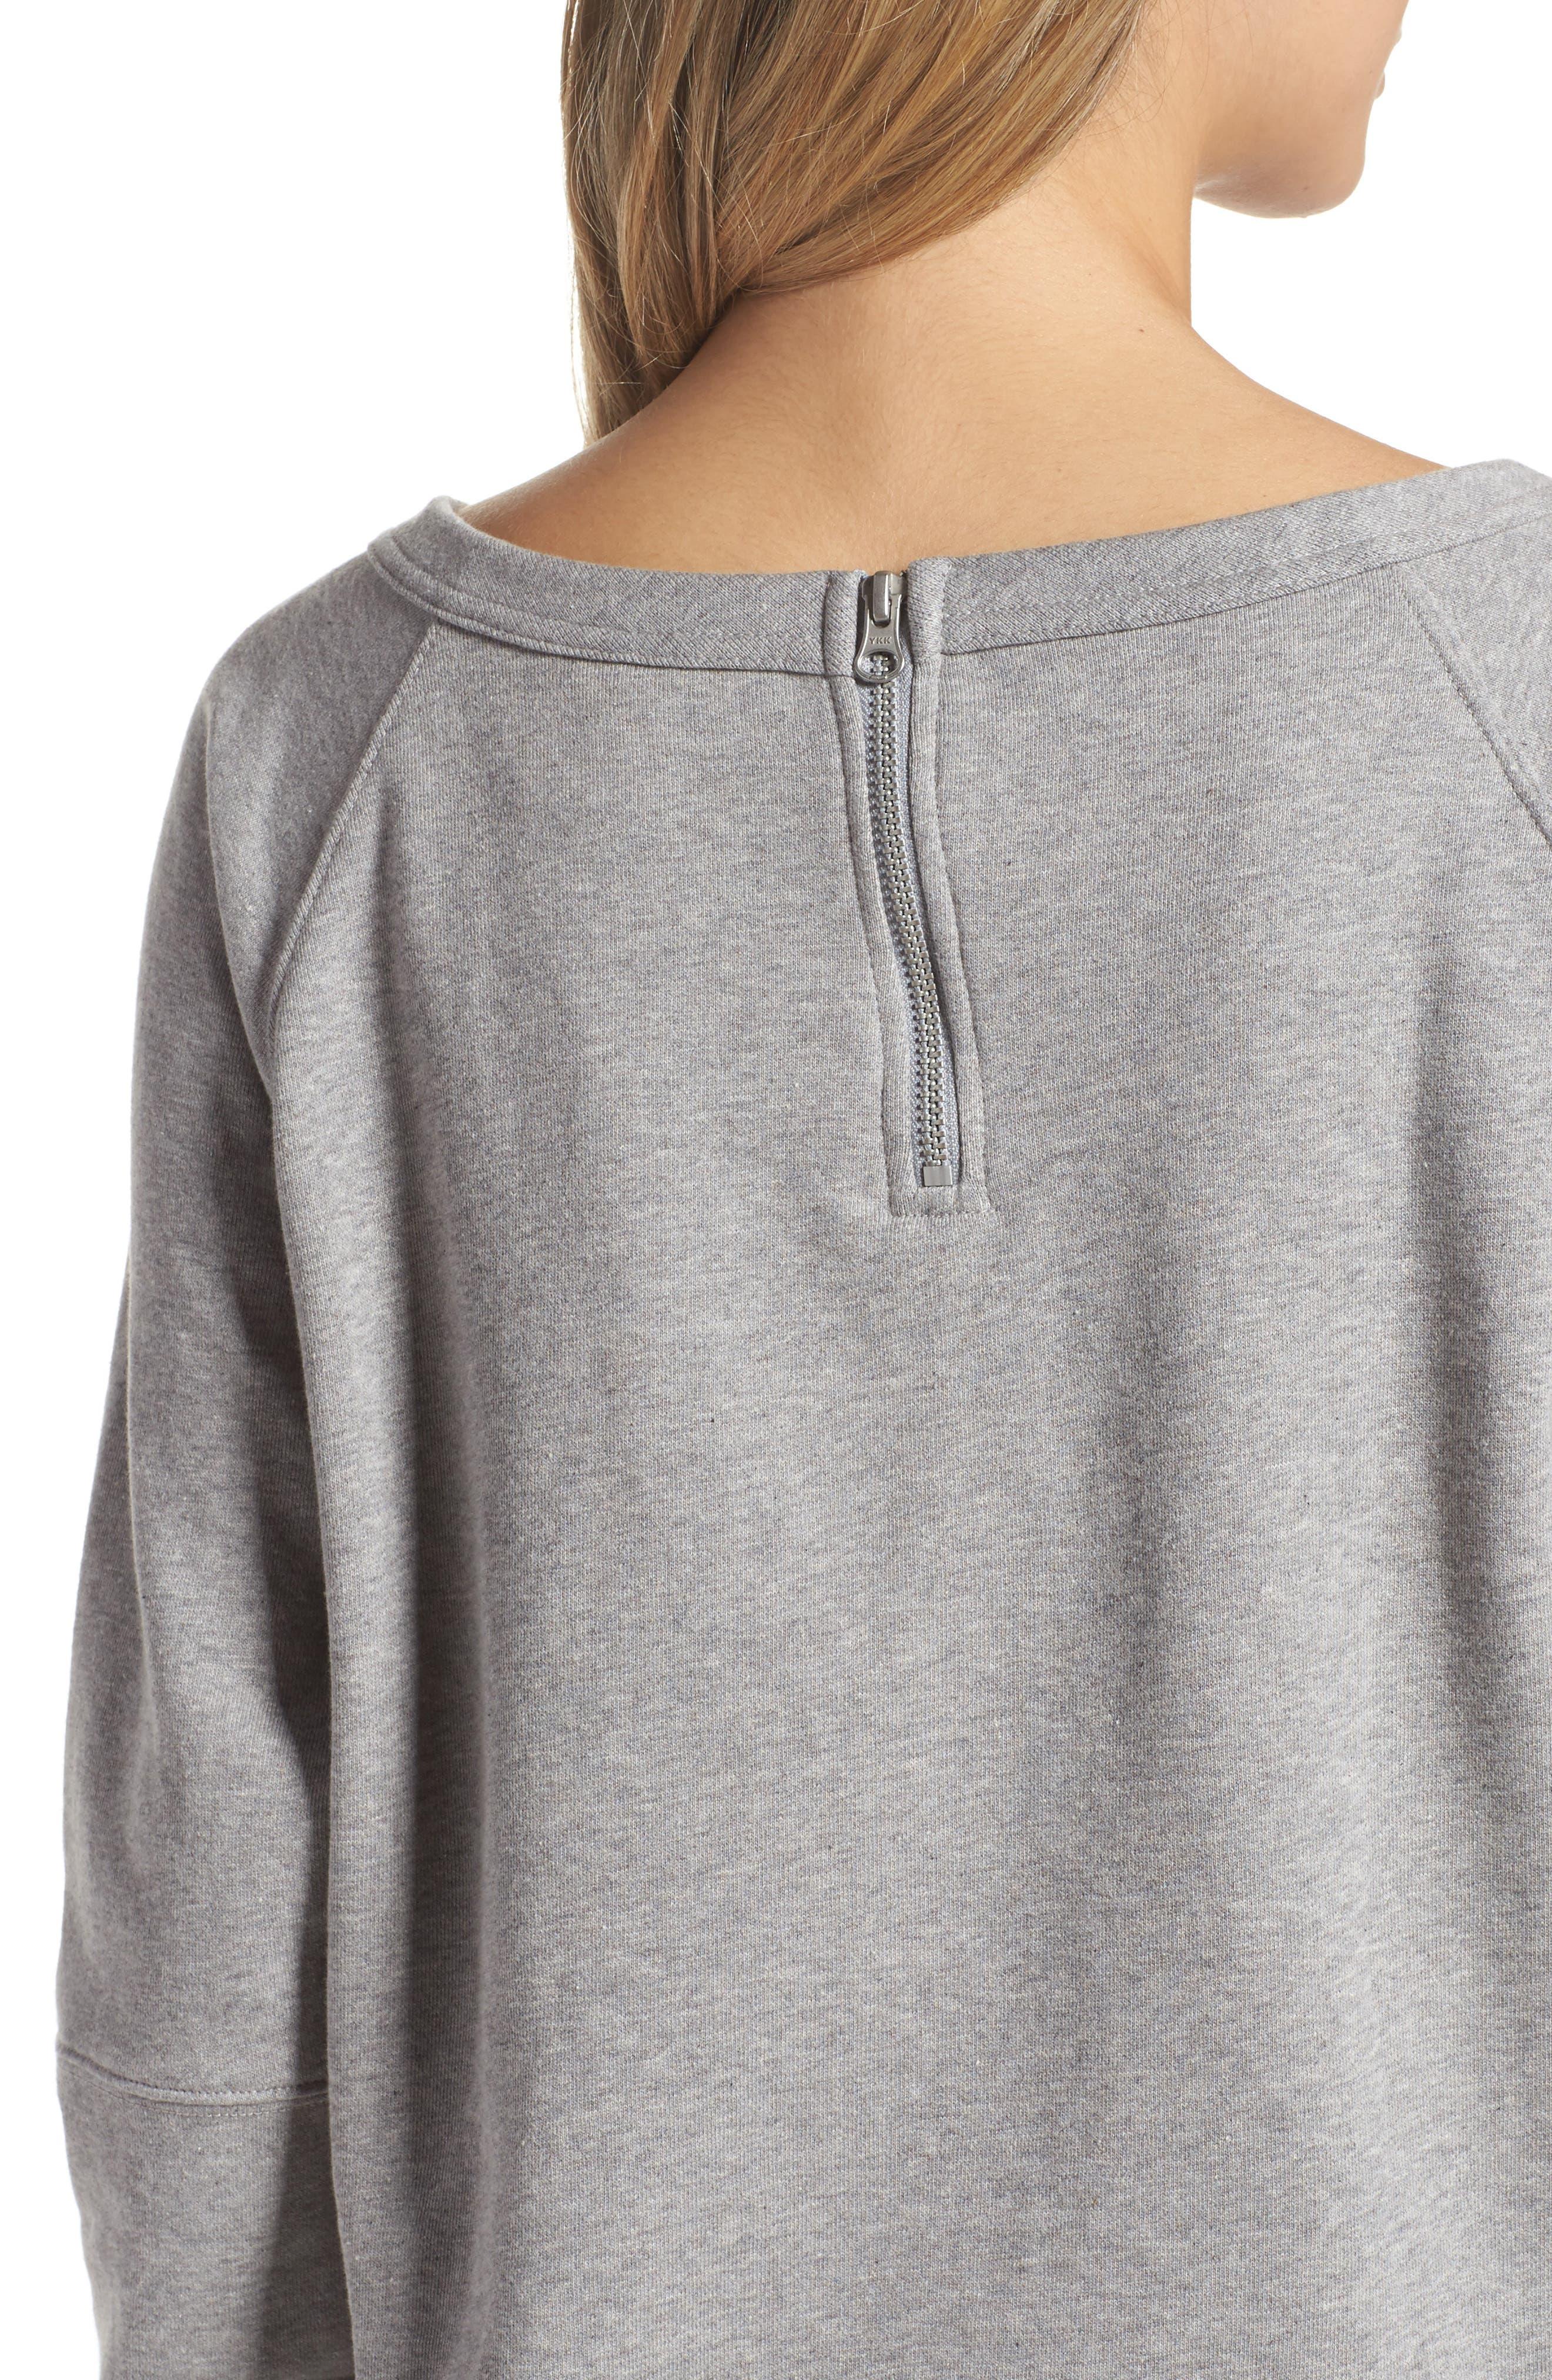 Heritage Starcrest Sweatshirt,                             Alternate thumbnail 12, color,